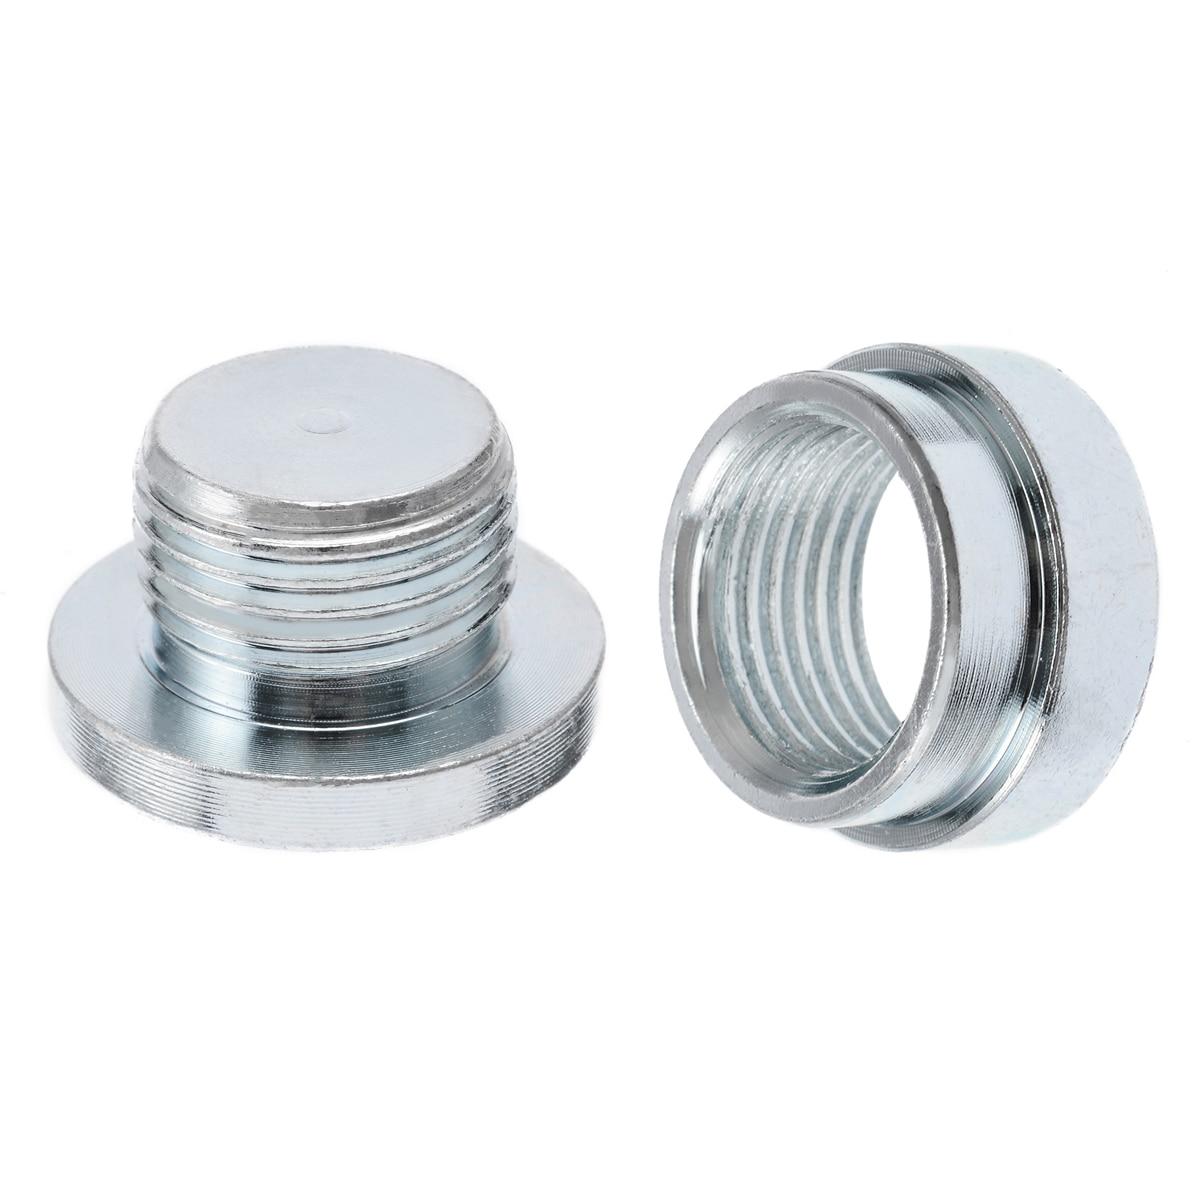 Mayitr 2pcs O2 Oxygen Sensor Stainless Steel Iron Weld On Bung Plug Nut Cap Kit M18x1.5